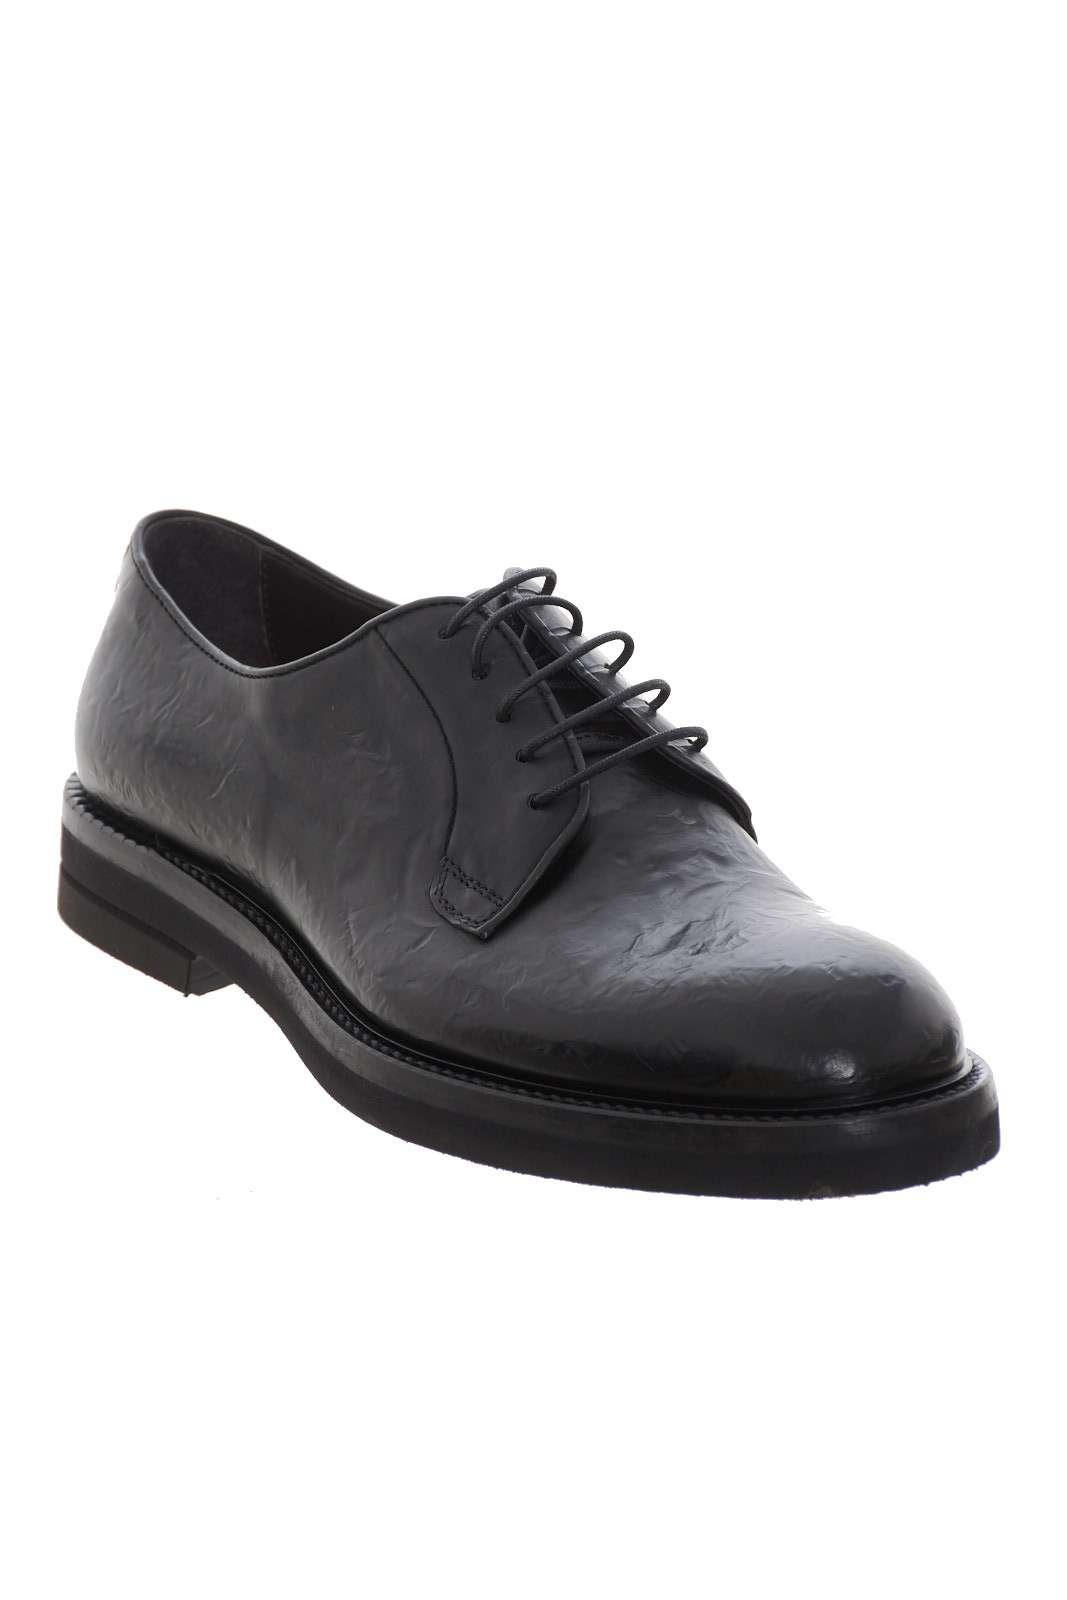 AI-outlet_parmax-scarpe-uomo-Corvari-8561-